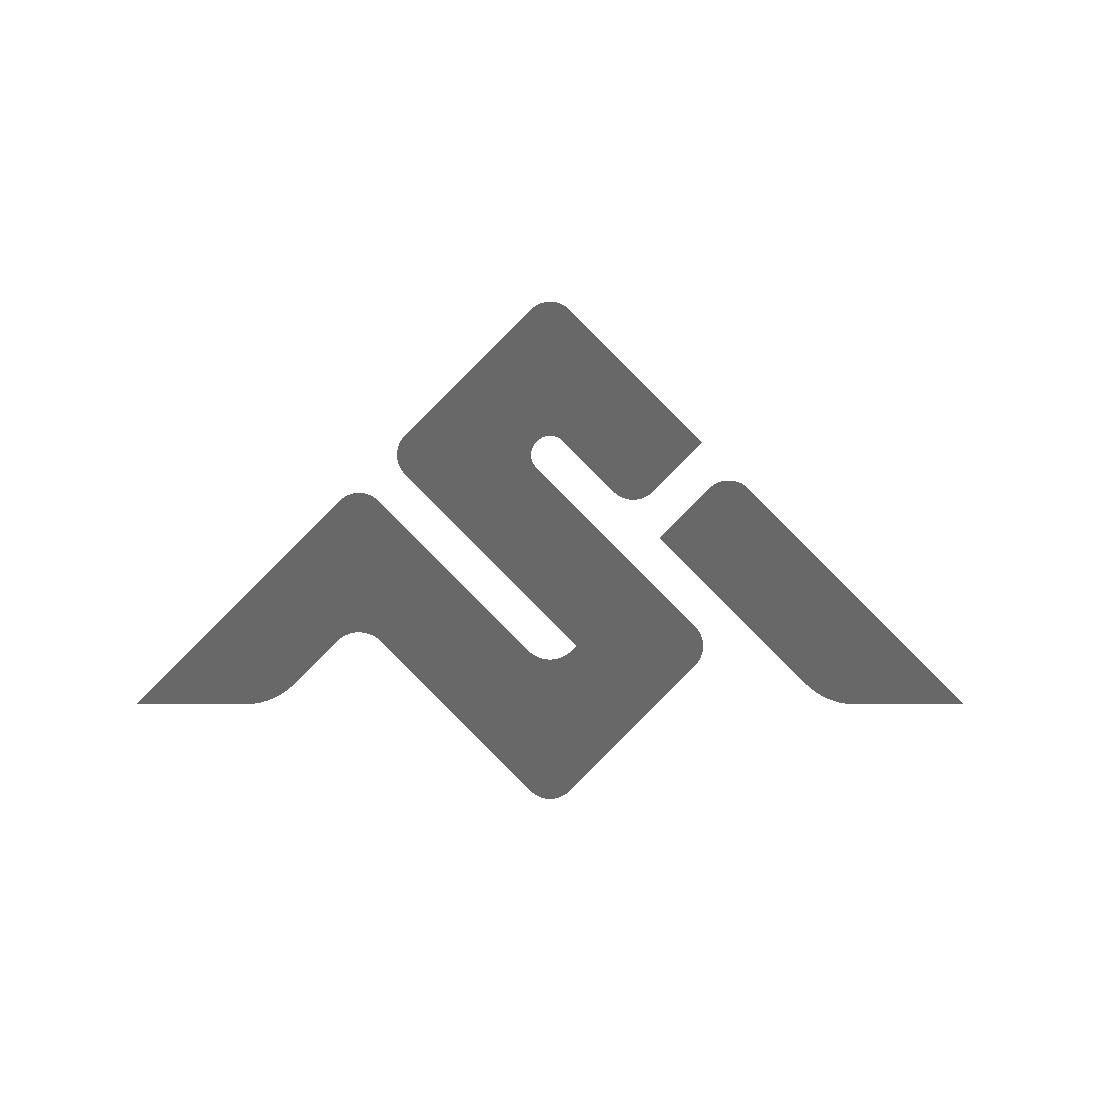 De Cqwdrxboe Qst100 Salomon Magasin Chaussures Shop Freerideachat Ski BeWrdxoC